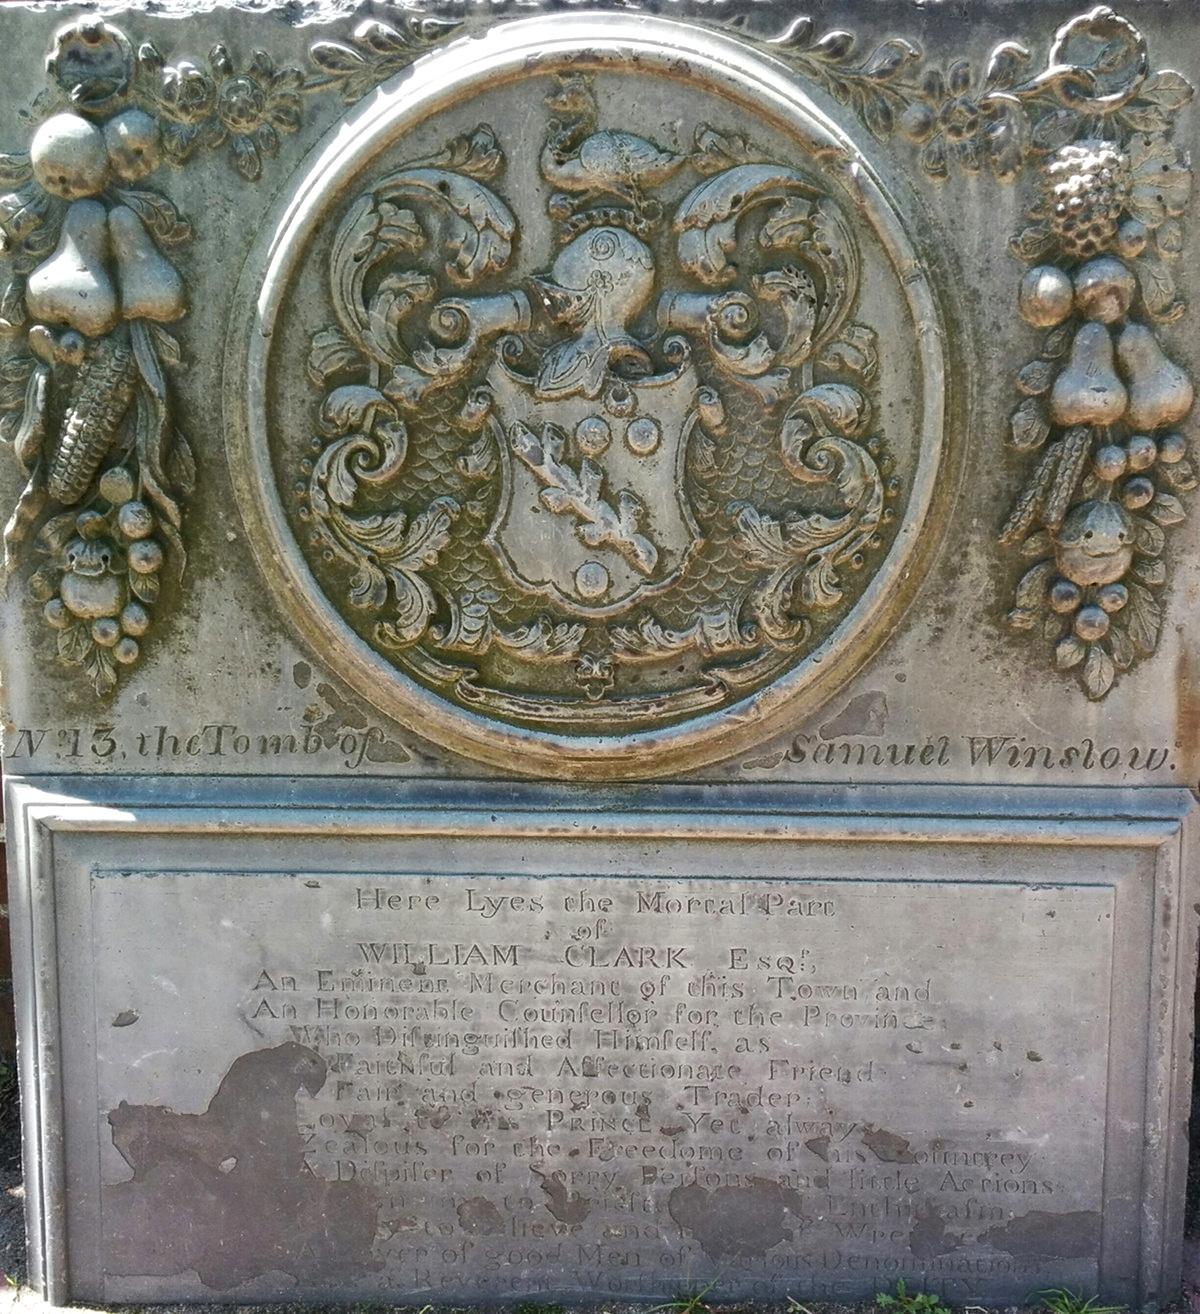 Heraldic Headstone carving